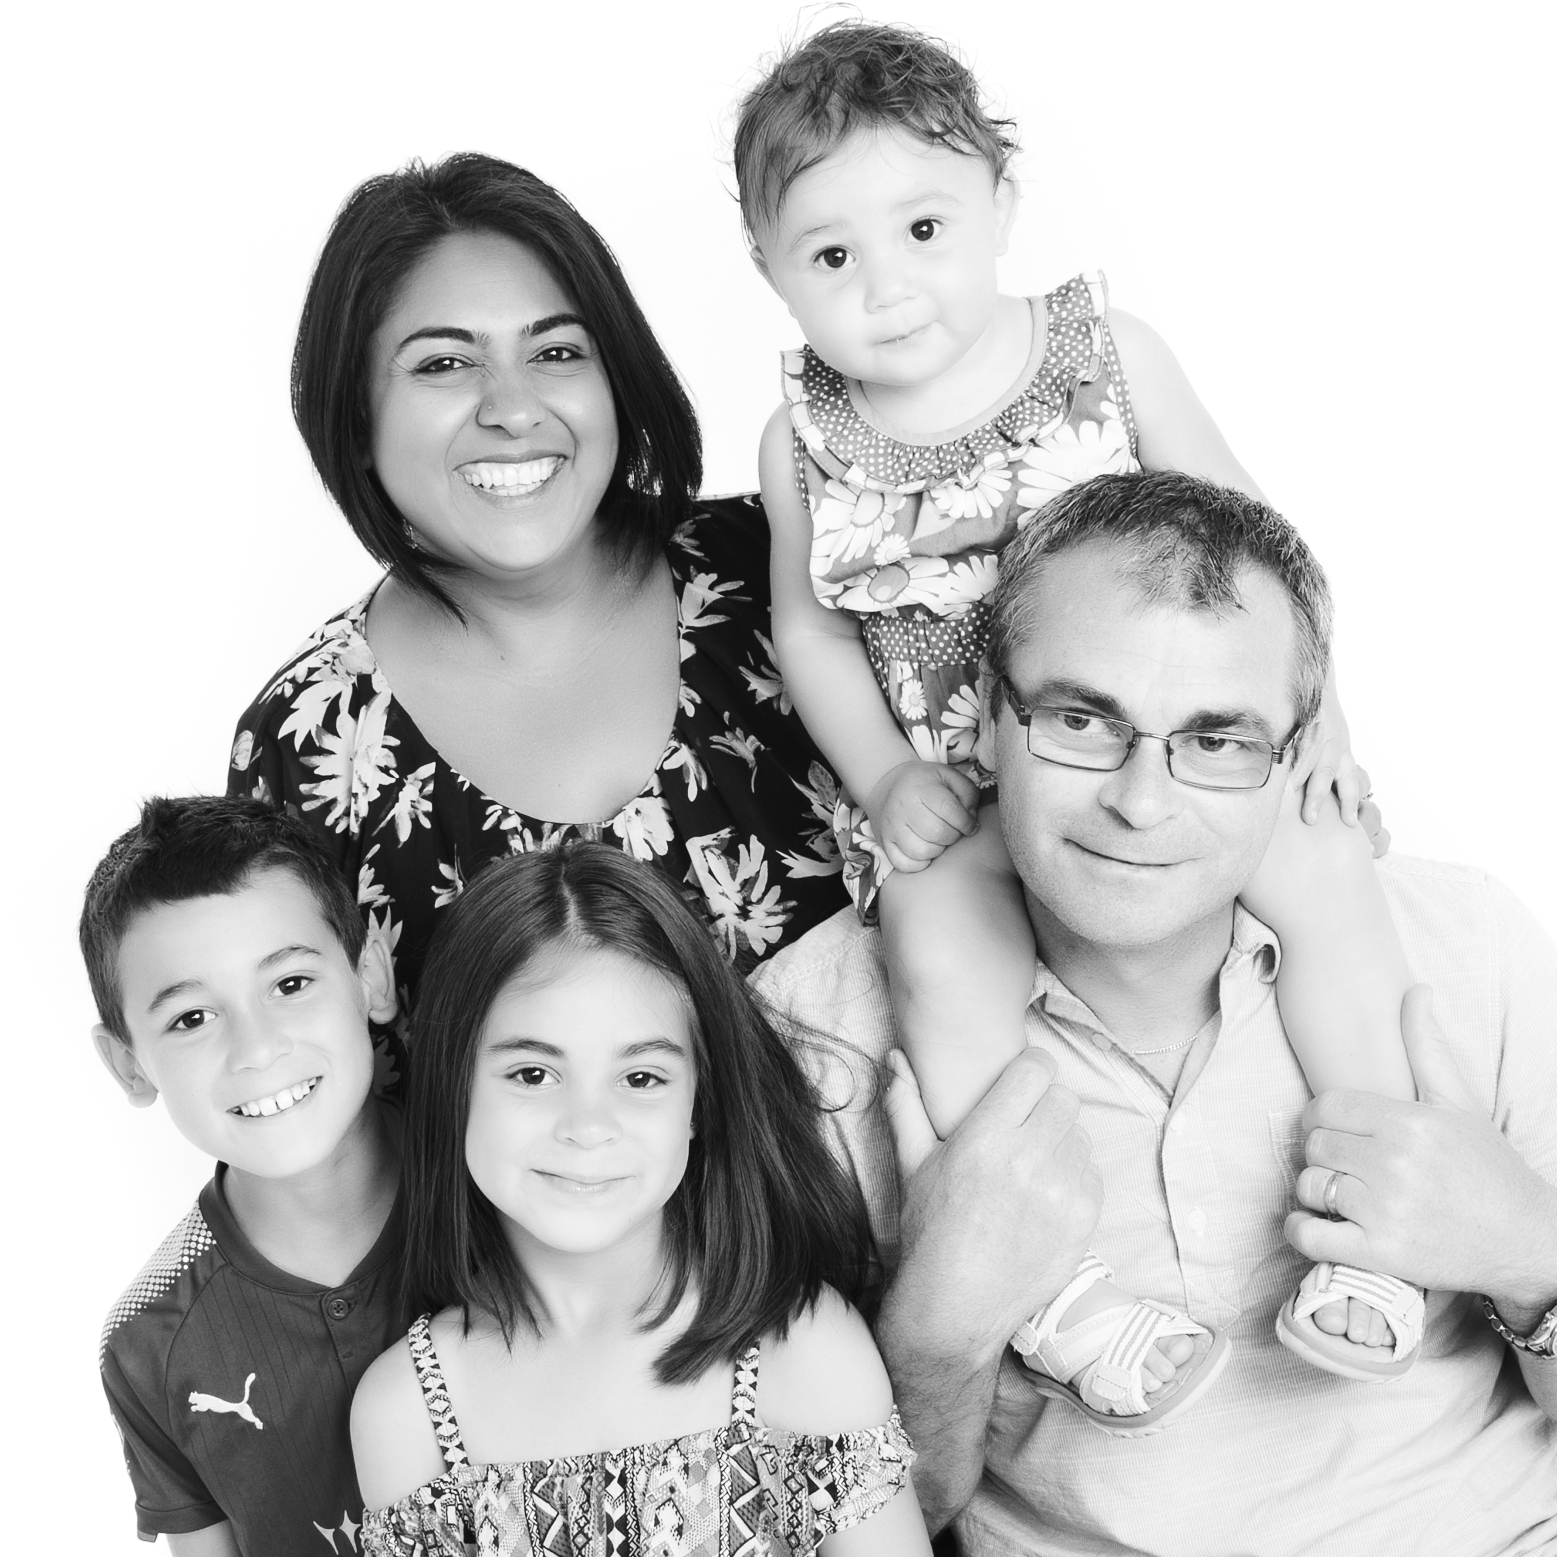 family-photography-leicester-photo-shoot-portrait-photos-photographers-kids-zigzag-zig-zag.JPG